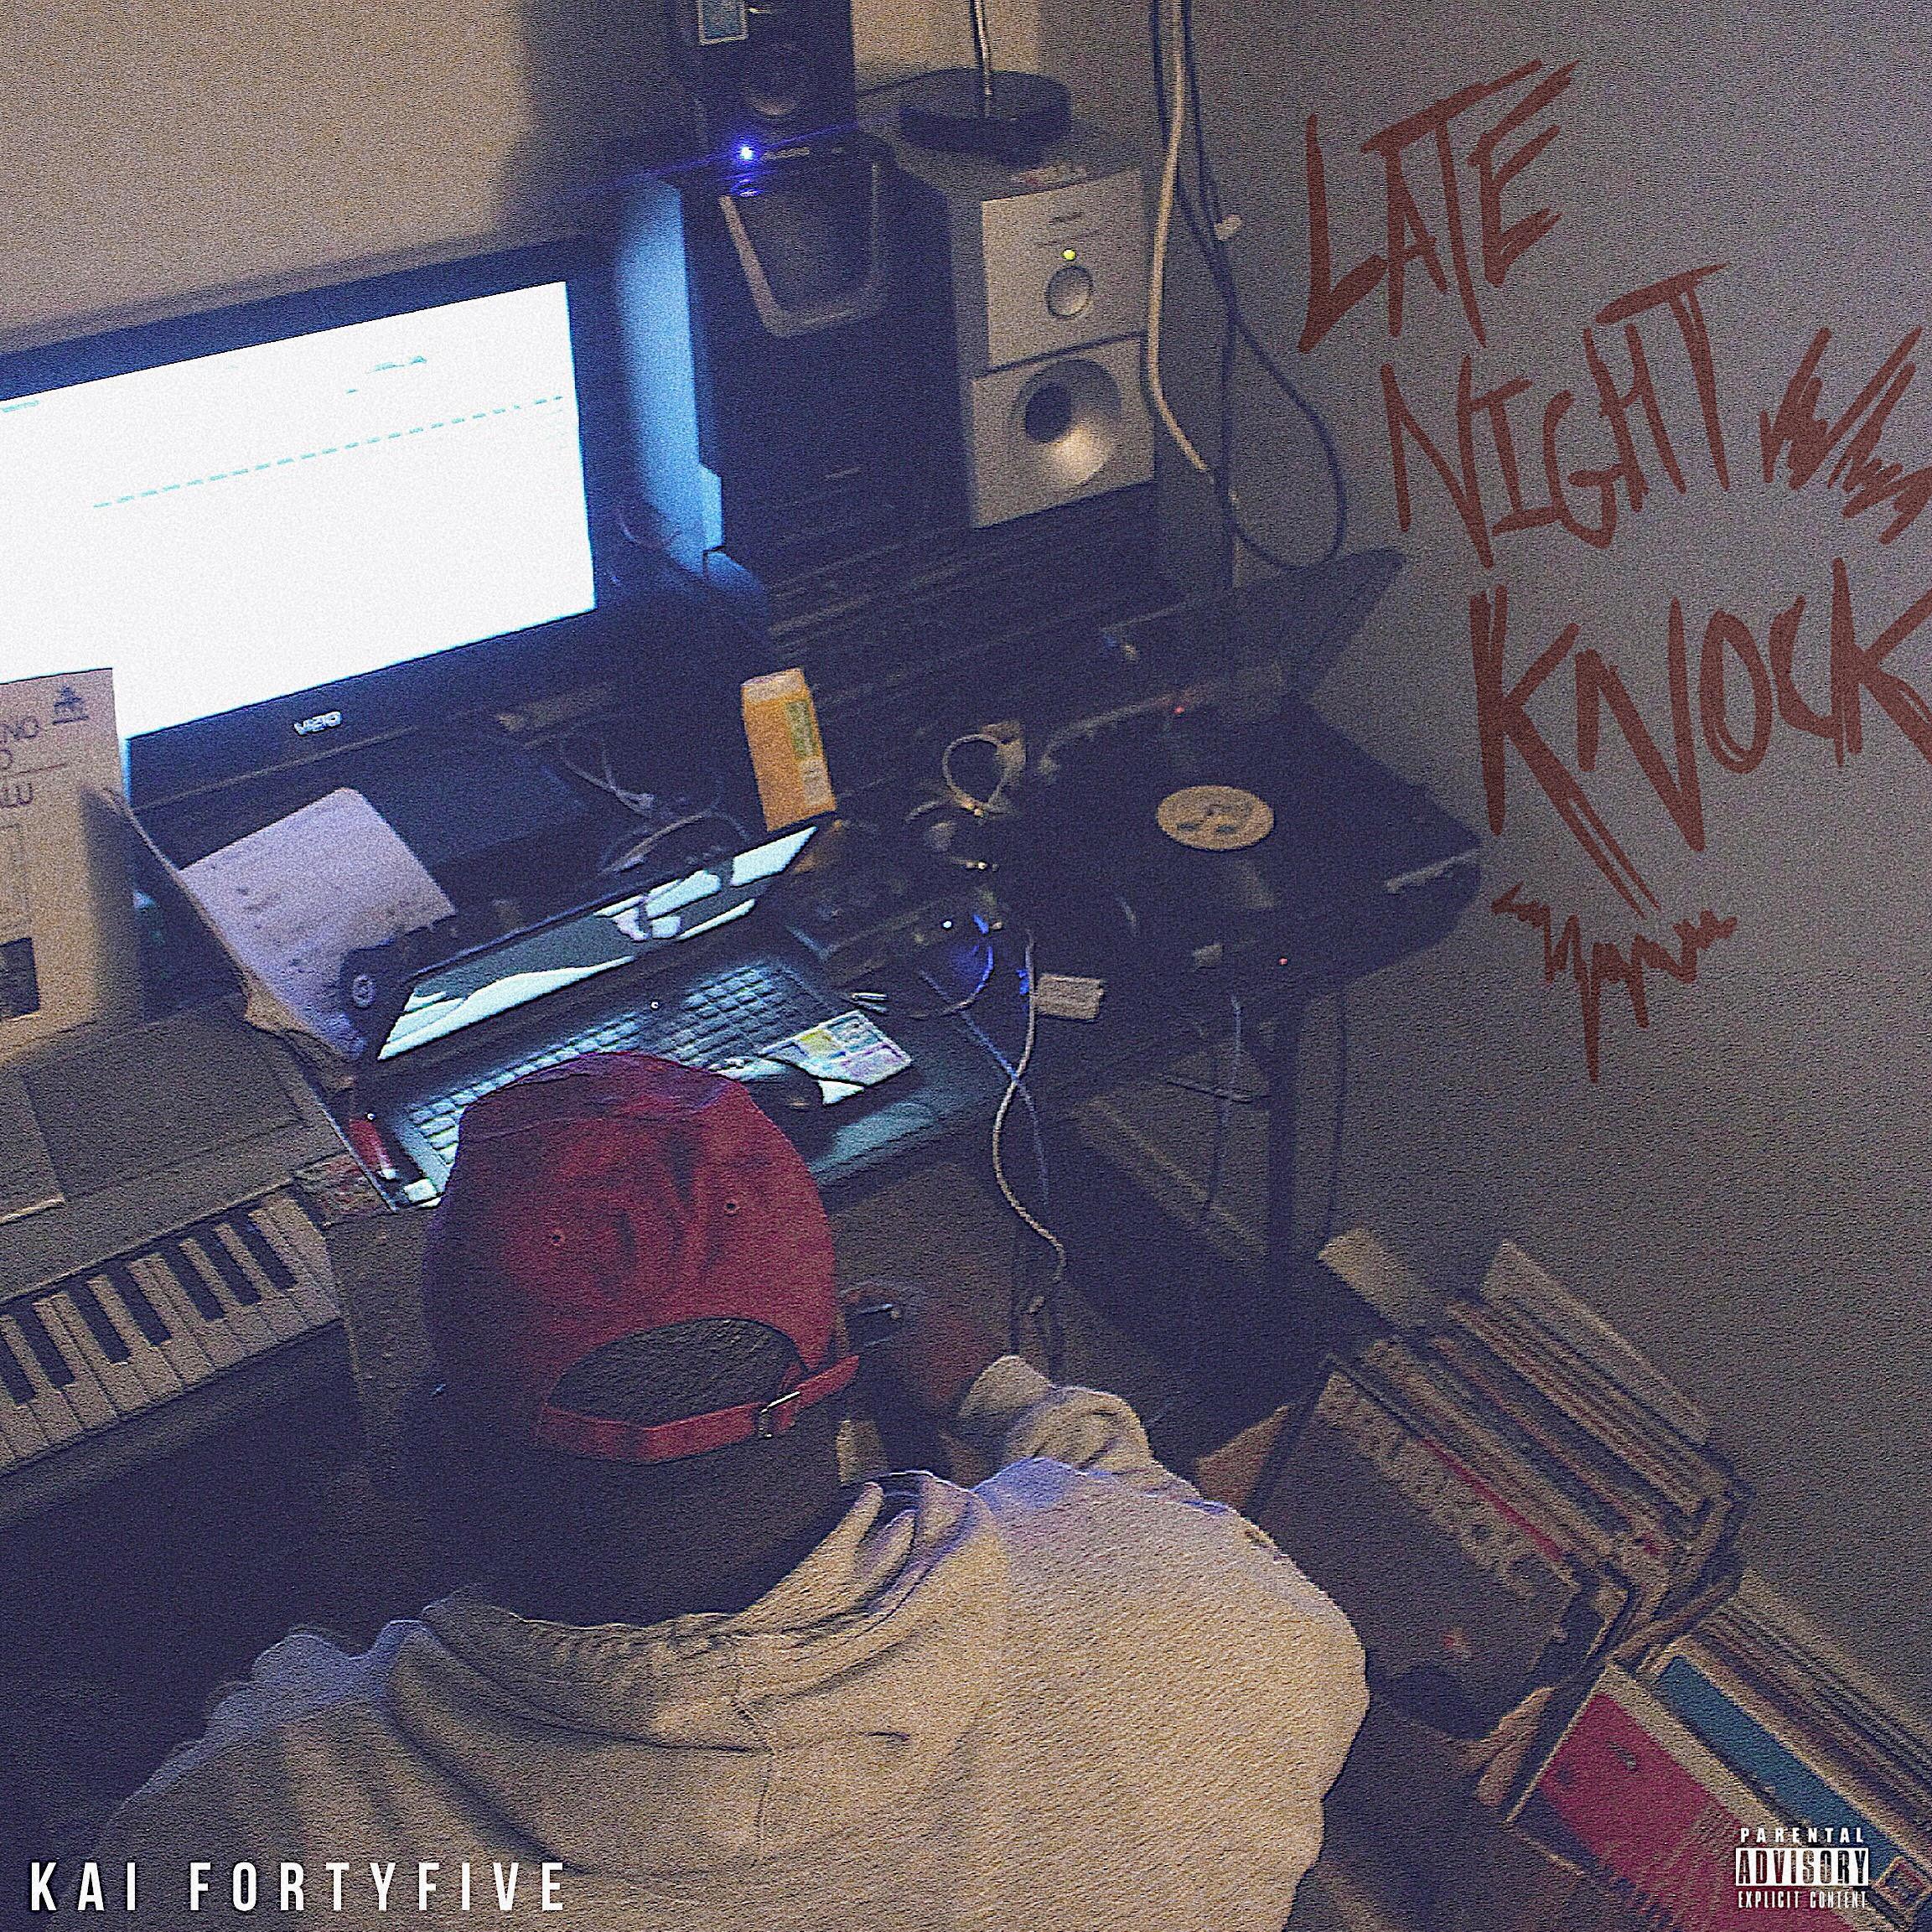 KAI FORTYFIVE - LATE NIGHT KNOCK